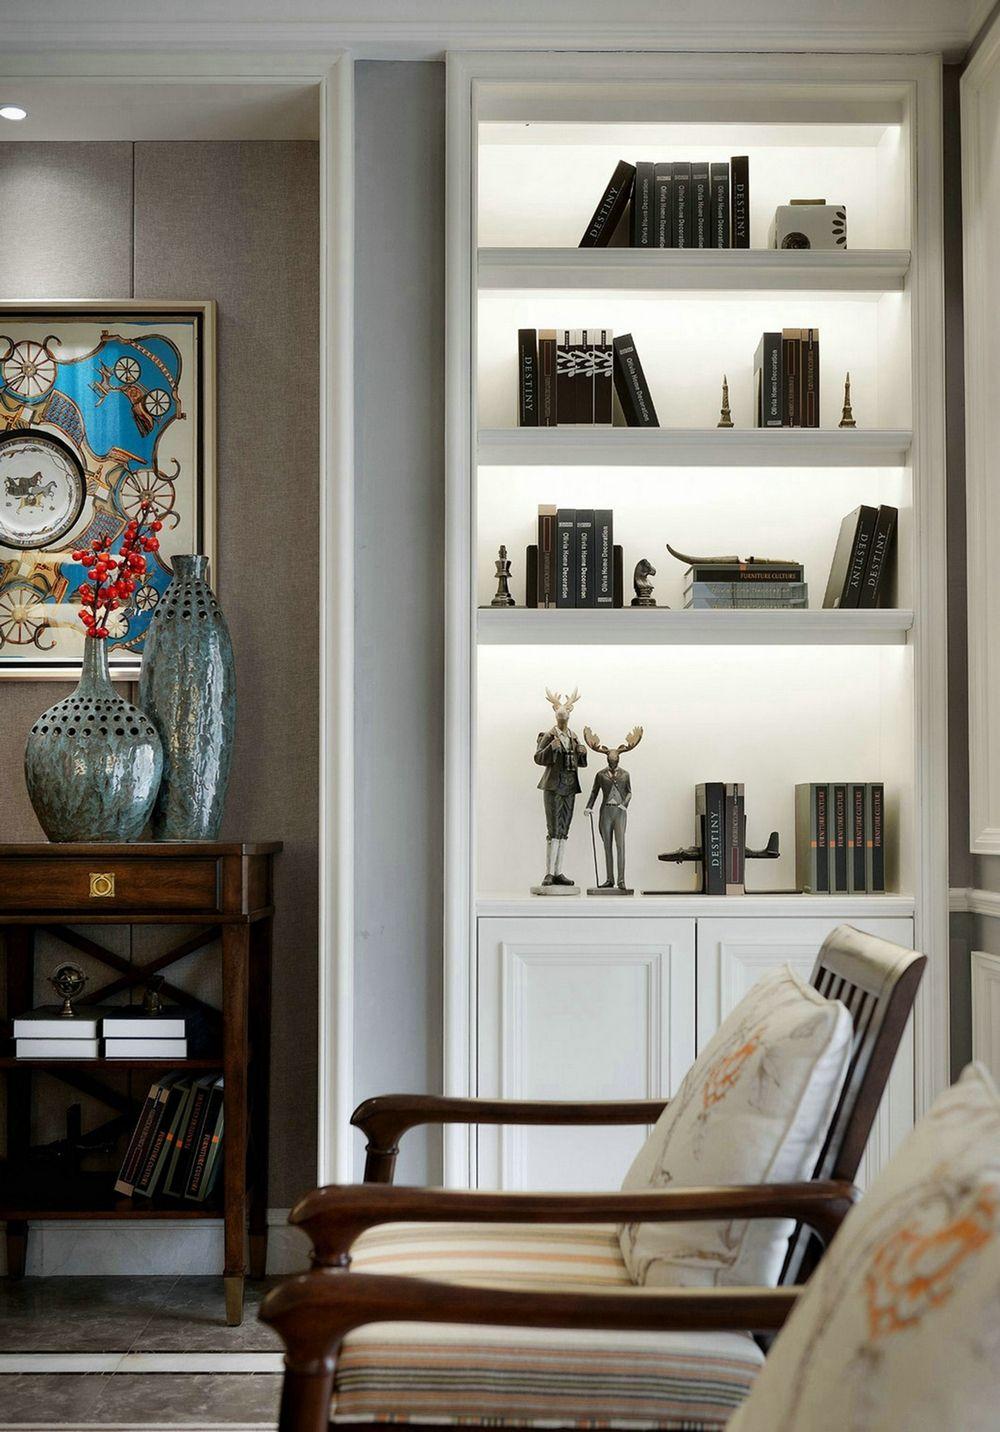 American Home Interior Design Interior Design London